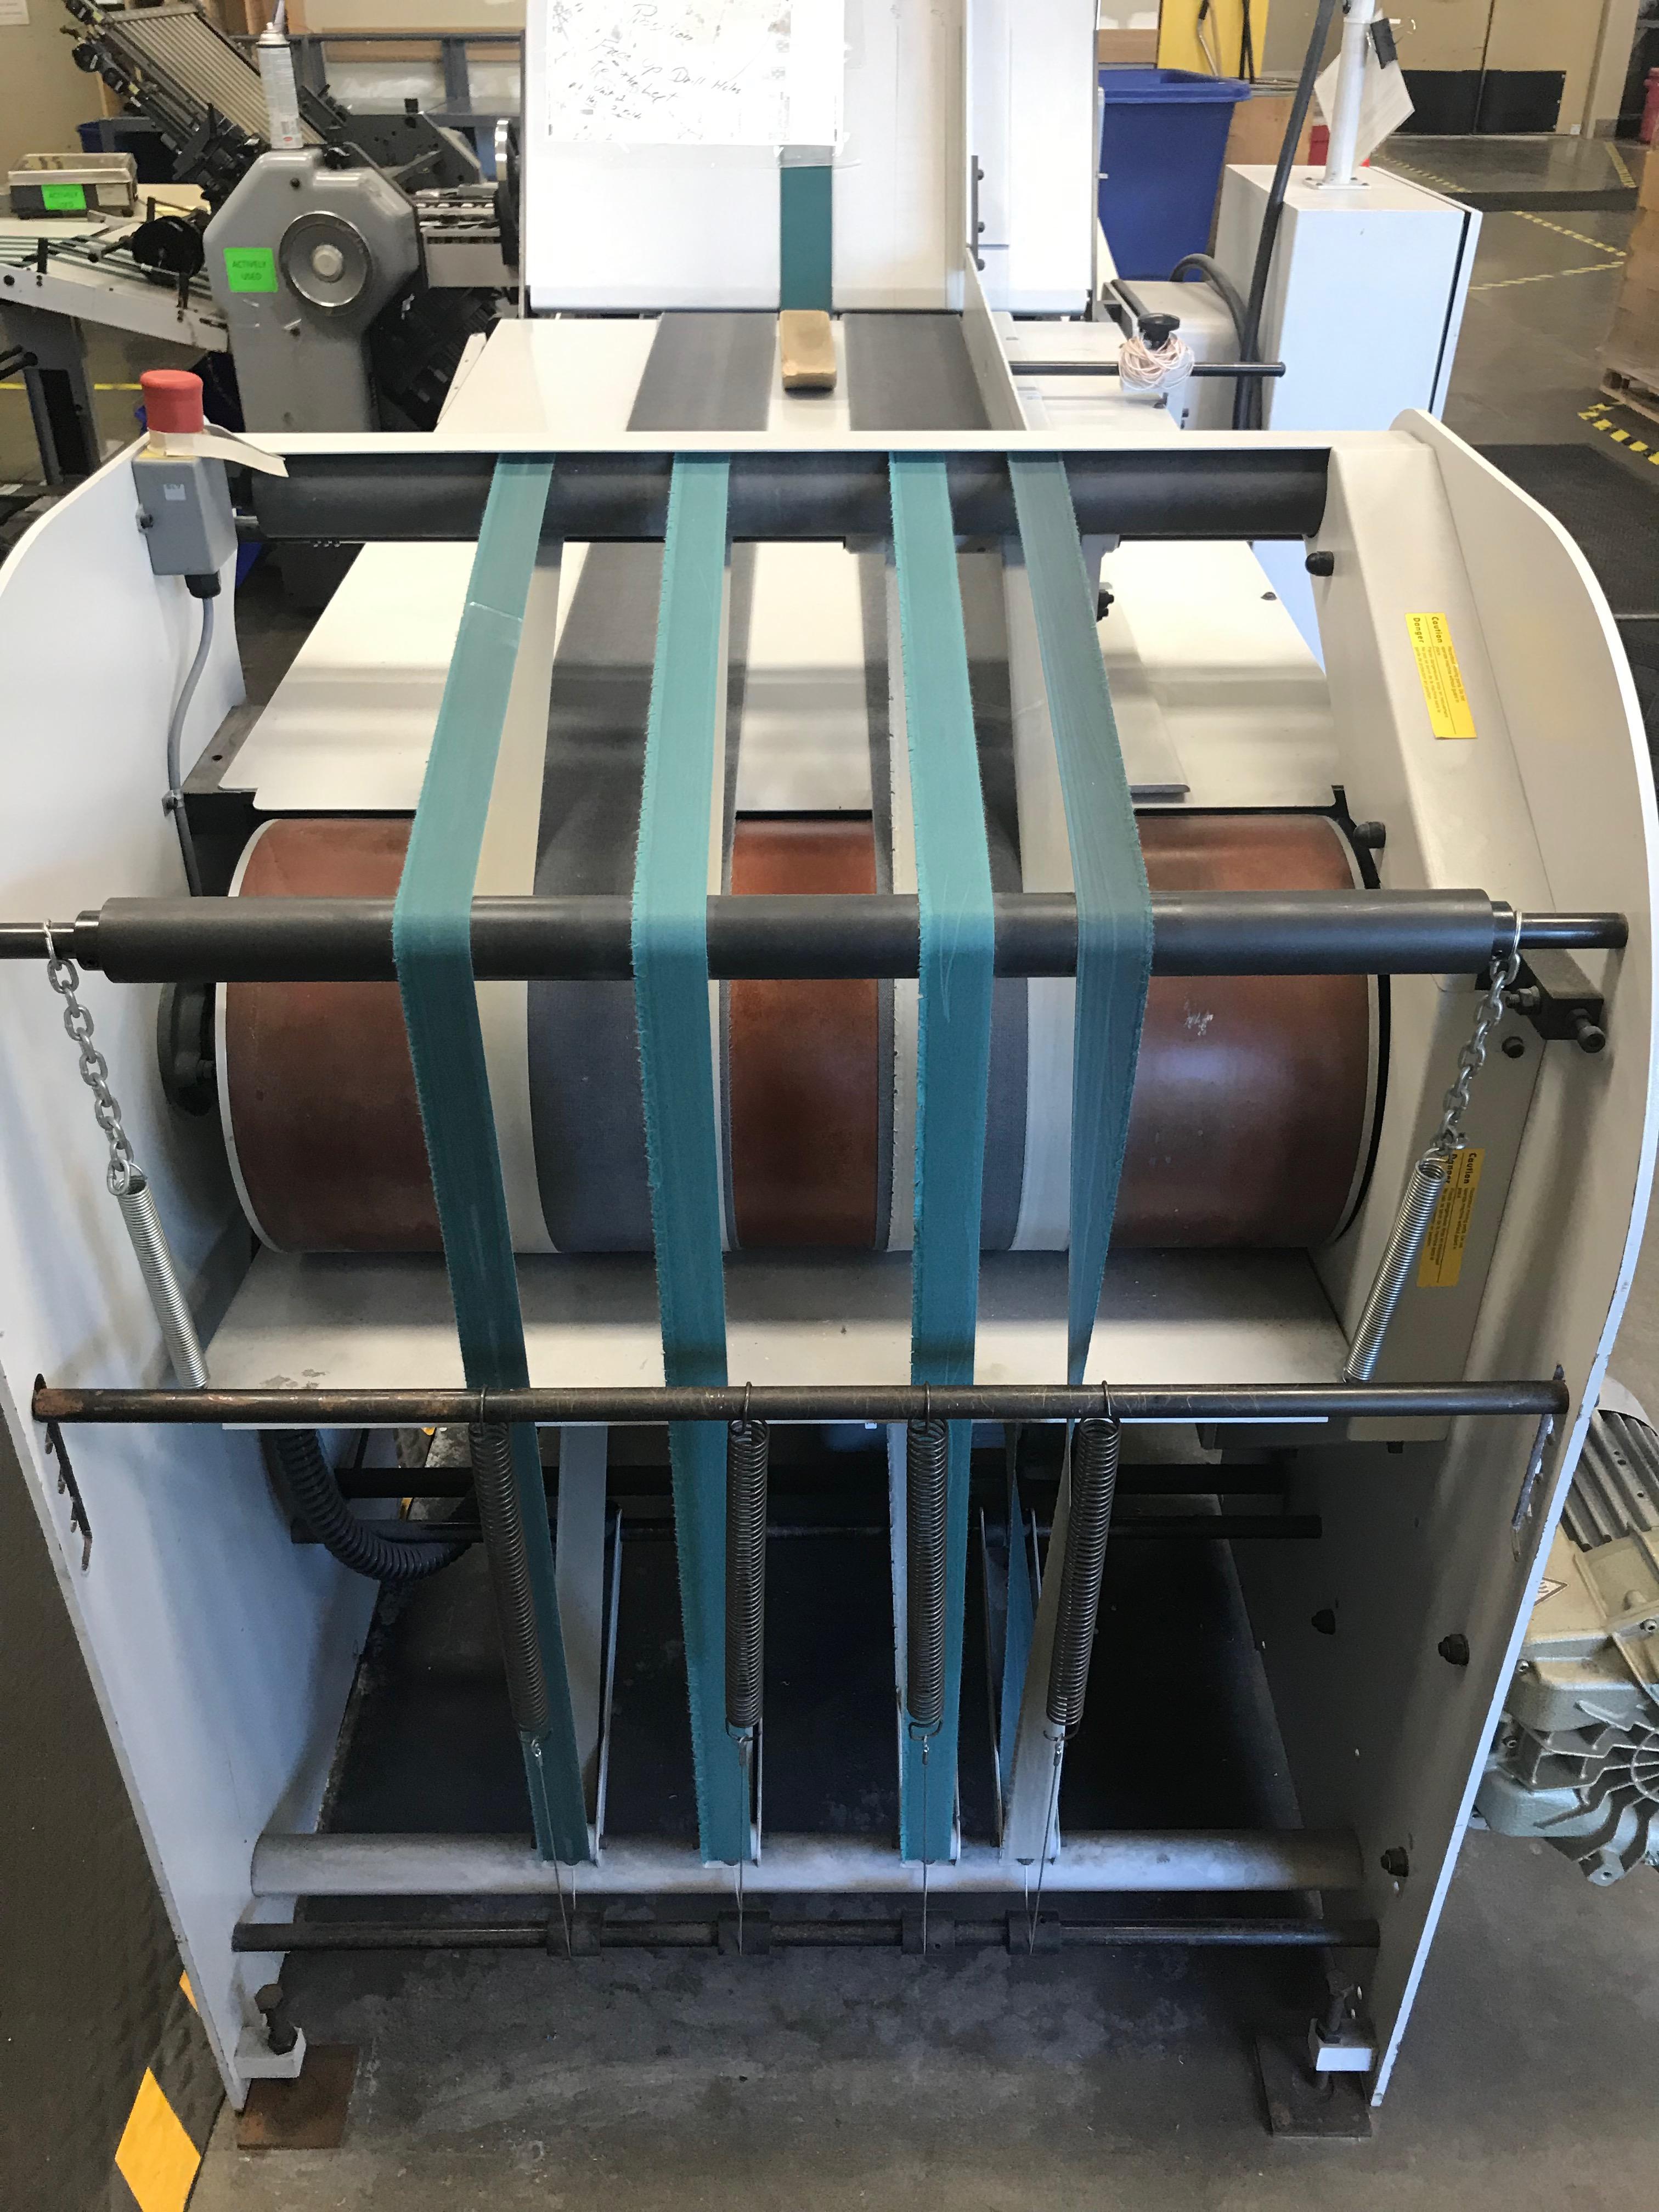 Heidelberg Stahl Folder, Model# 1426E-C-3 AND Model# 1426D-RS, Serial# 140PI0017 AND Serial# - Image 12 of 14